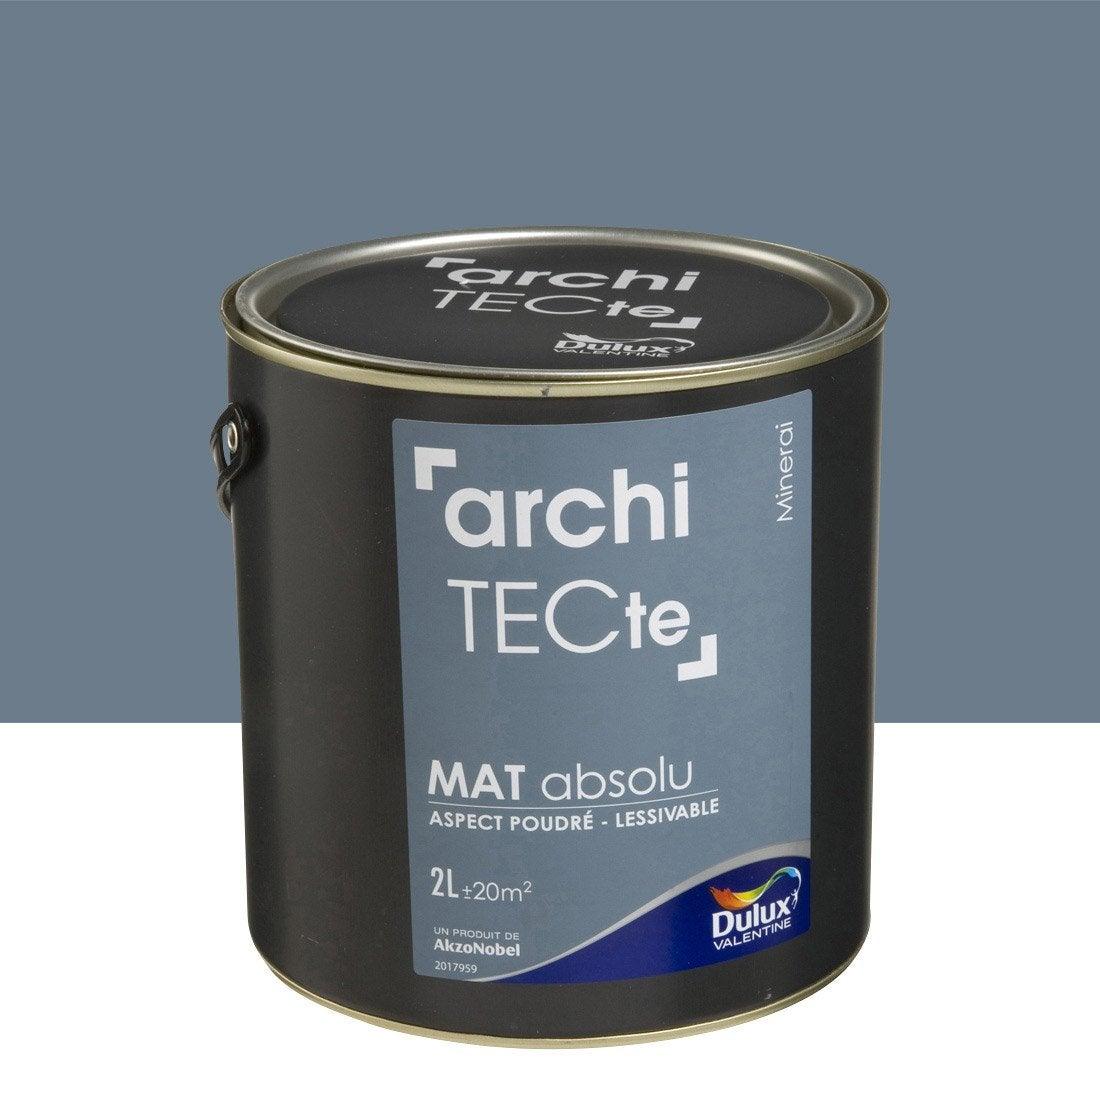 Peinture gris minerai dulux valentine architecte 2 l leroy merlin - Peinture craie leroy merlin ...